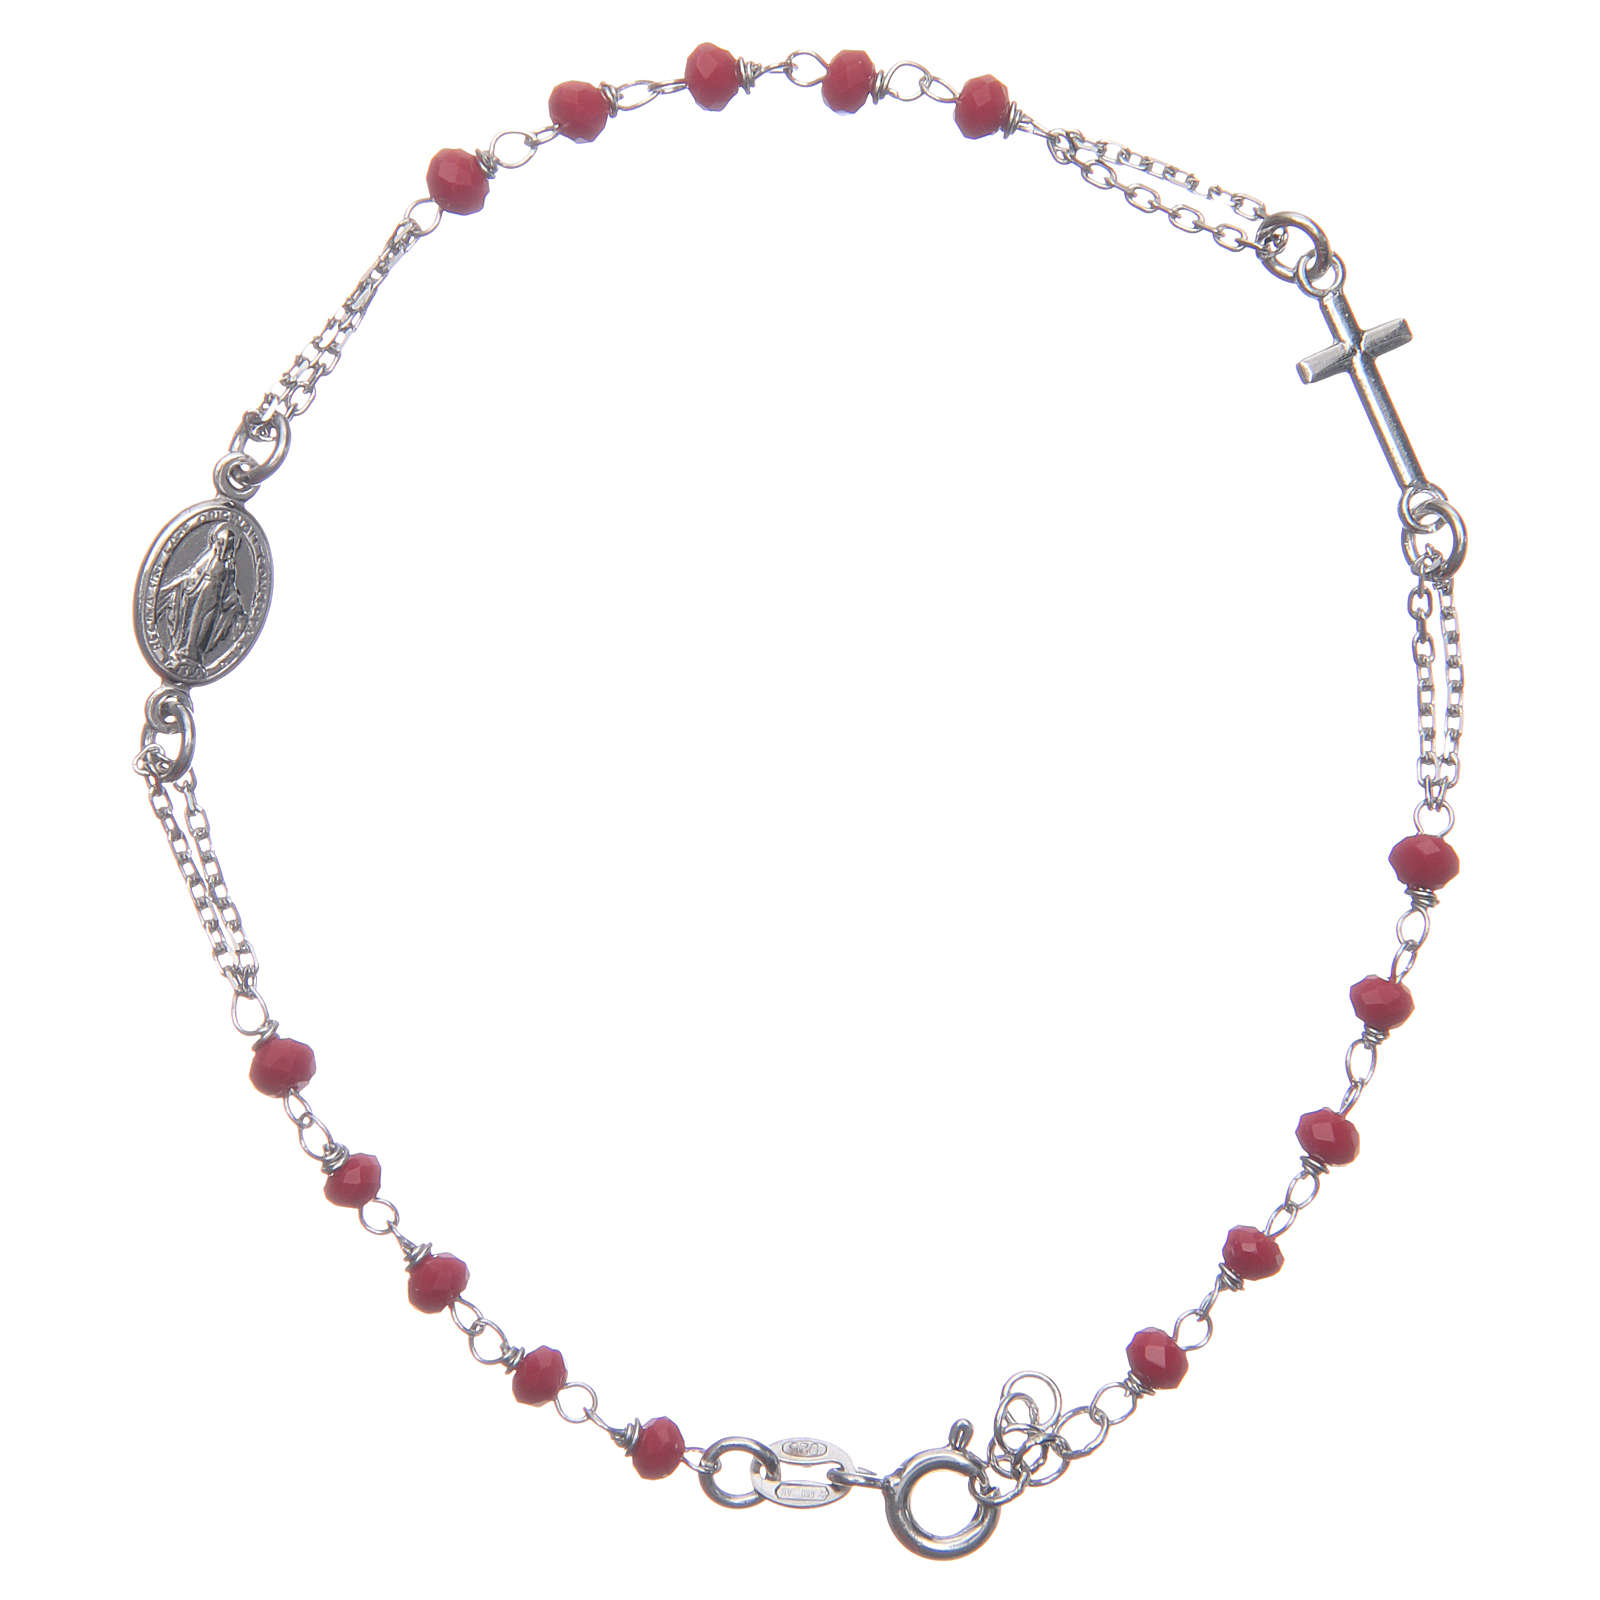 Bracciale rosario colore rosso Santa Rita argento 925 4